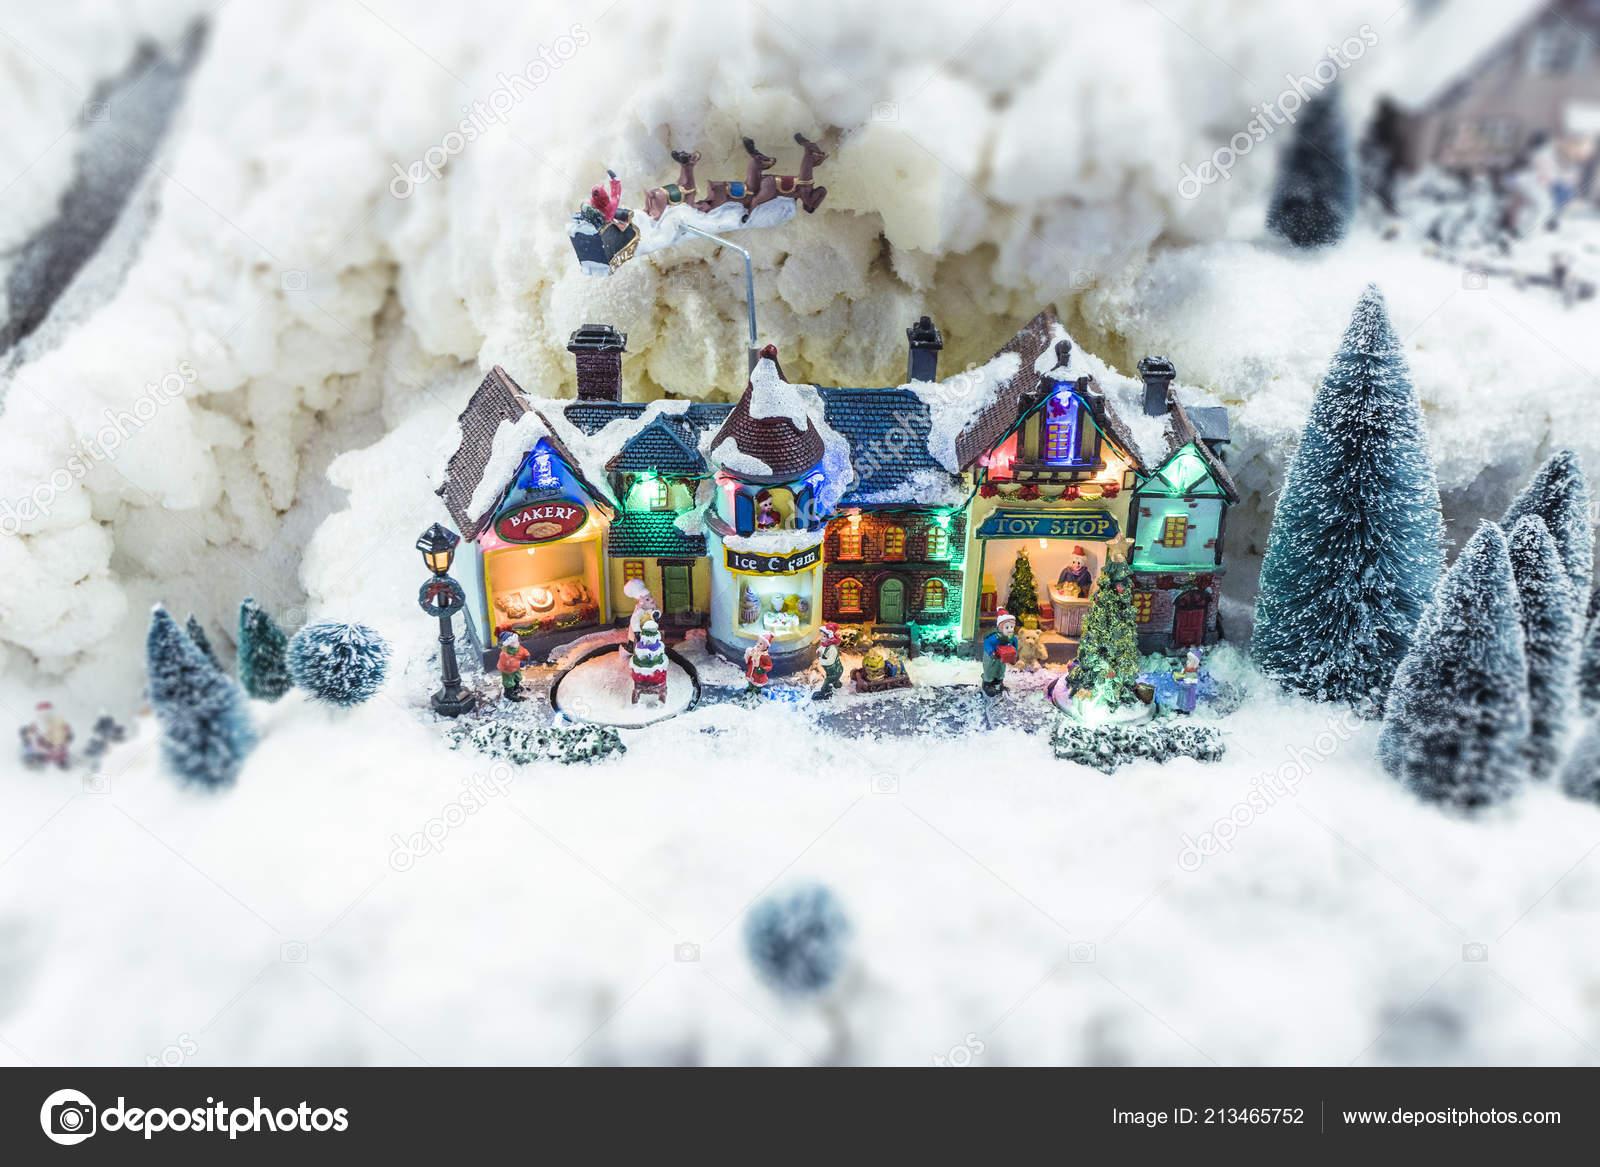 Miniature Christmas Village.Miniature Christmas Village Winter Snow Model Landscape Xmas